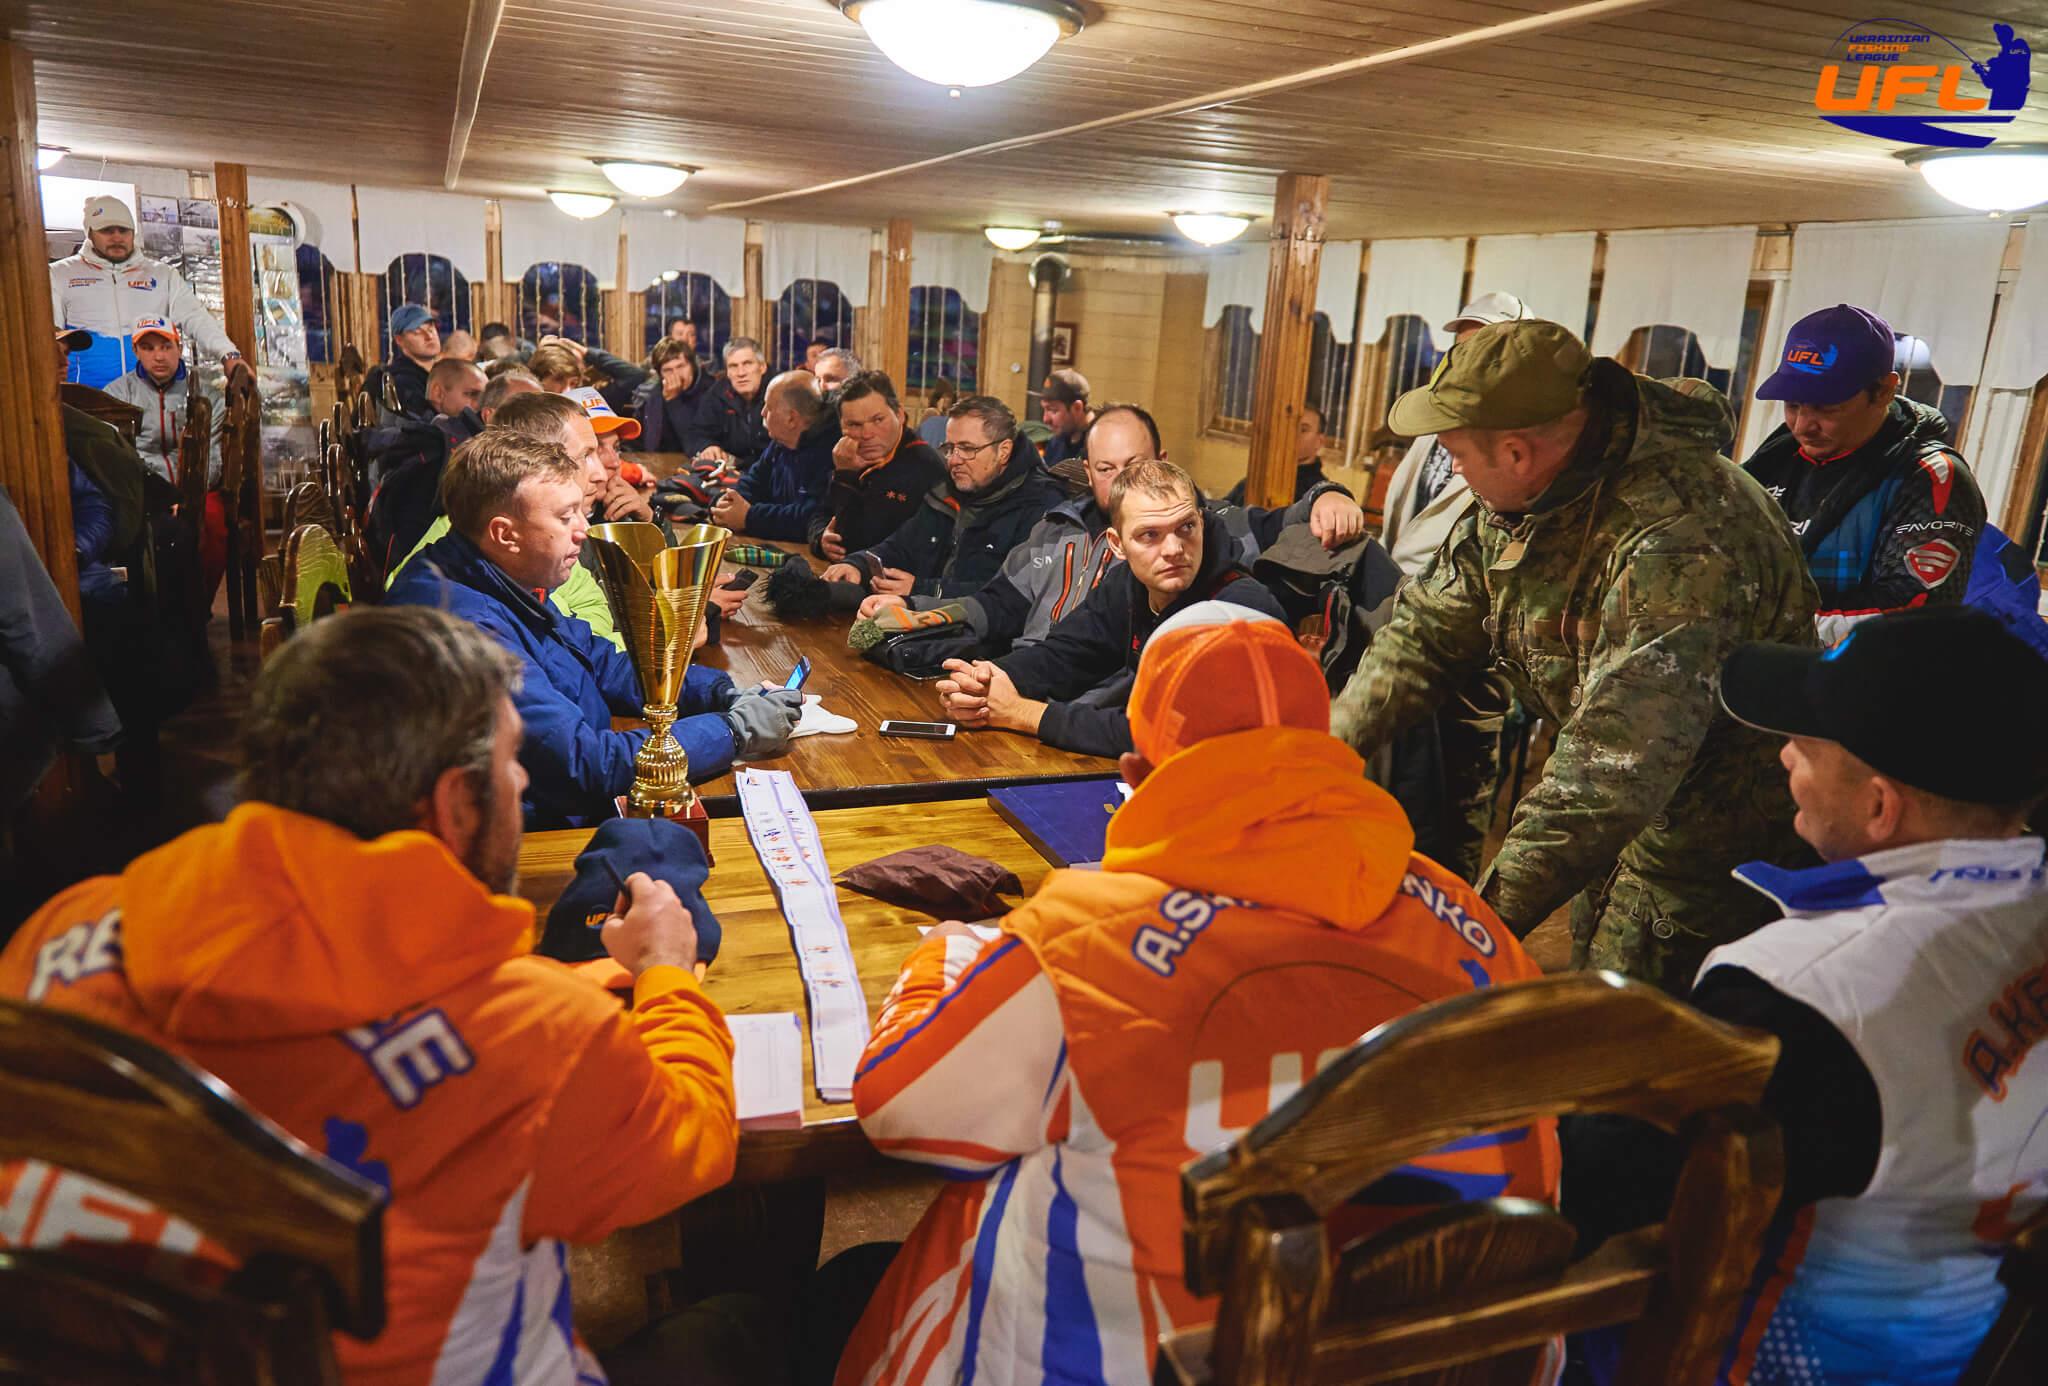 20-zbori-kapitaniv-komand-kerezvas-anatolii-shevchenko-oleksandr-barinovas-artur-bezverhii-kirilo-ivolgin-sergii-ivolgin-vadim-malinovskii-maksim-churin-yevgen-ta-inshi-zgidno-fai-lu